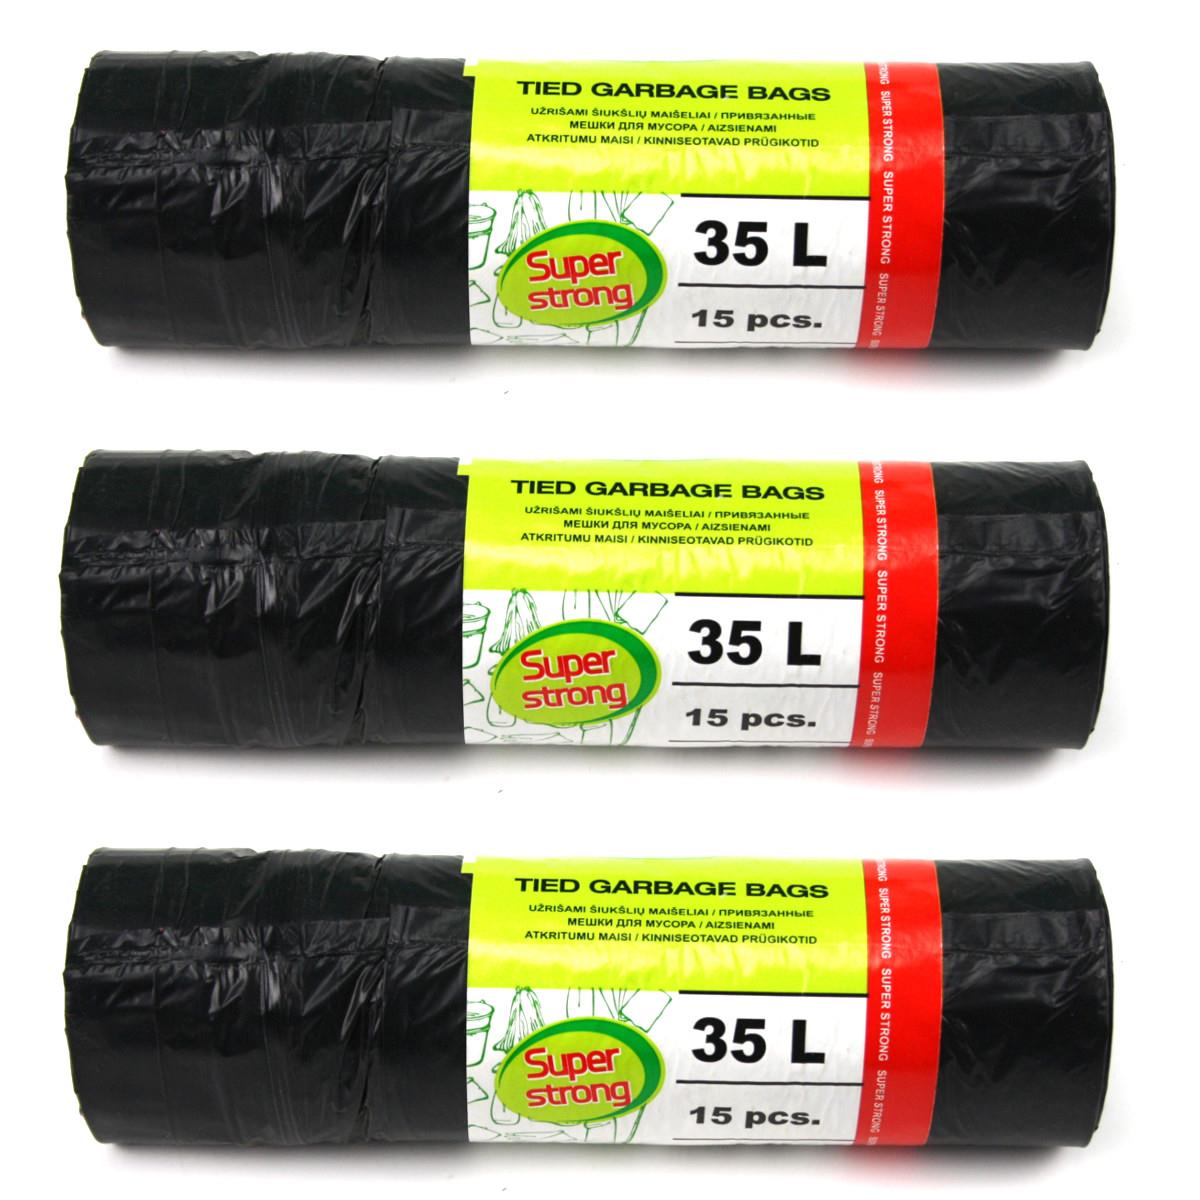 Müllbeutel Zugband 35L Müllsack mit Zugband Abfallsack Sack Säcke 45 Stück,OKKO,5900942683208, 4243067014801